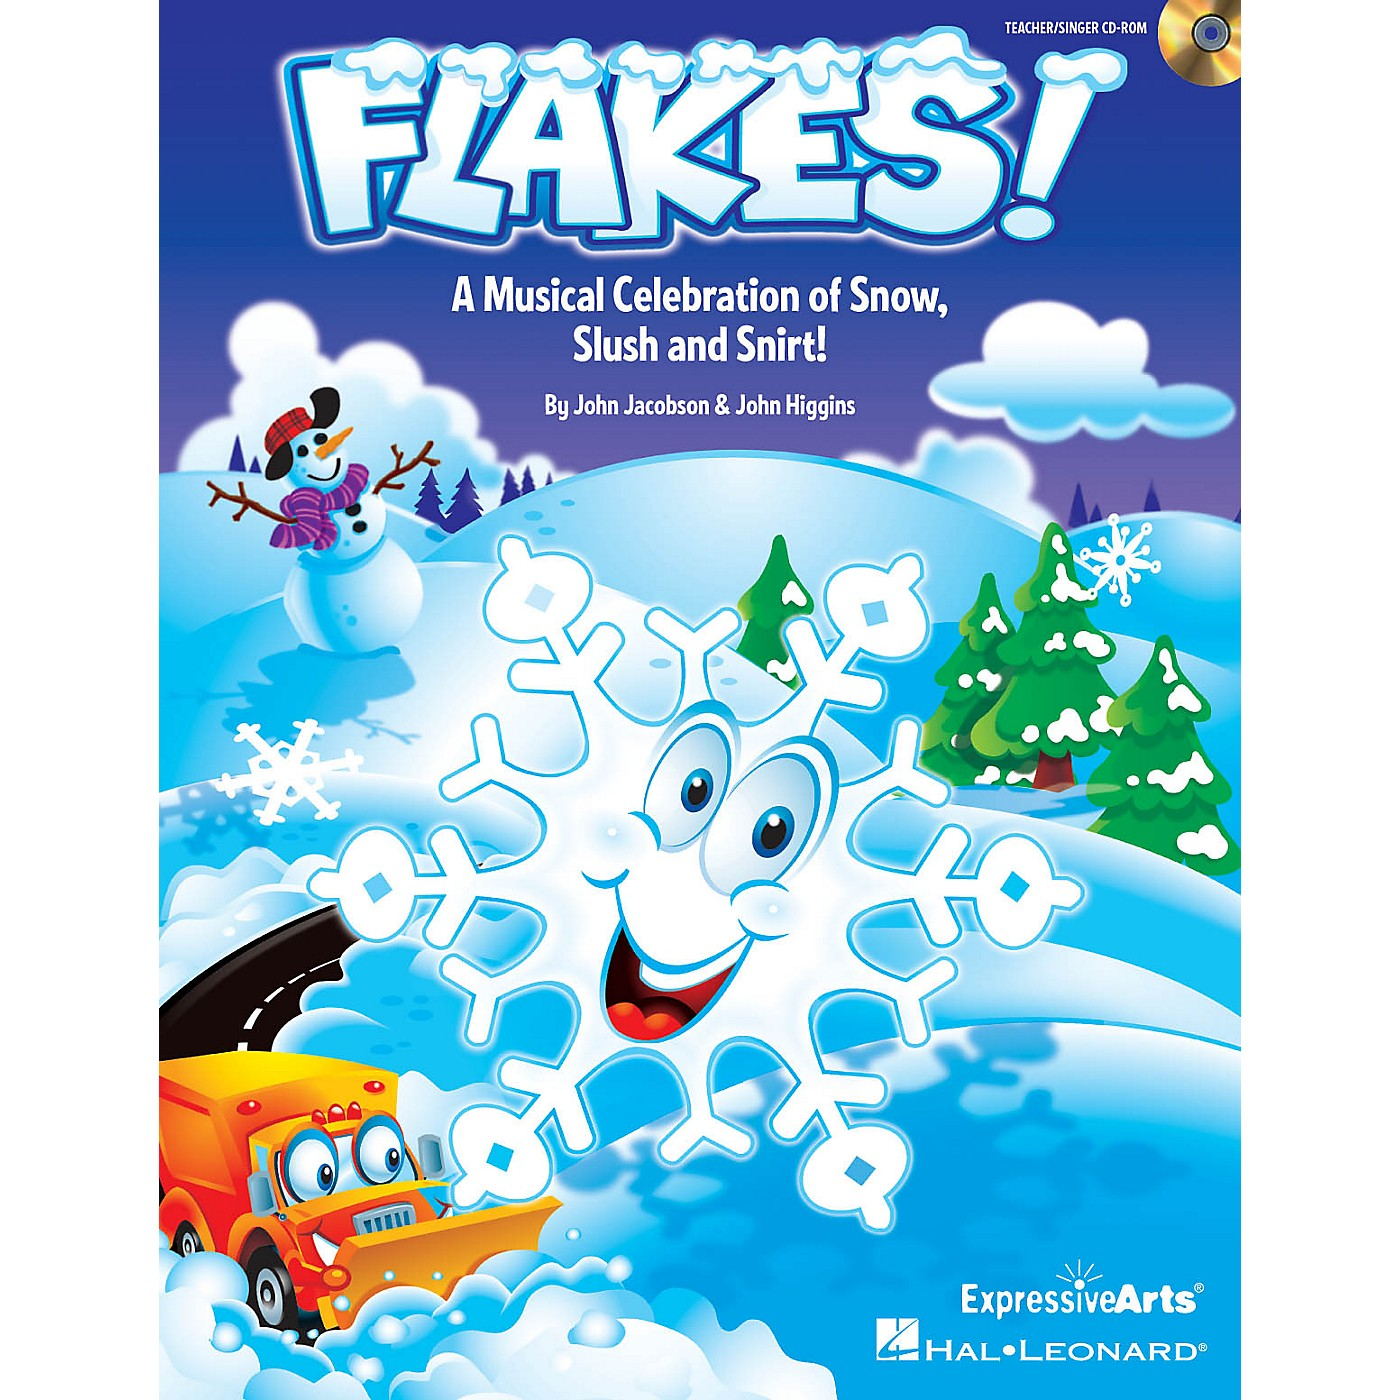 Hal Leonard Flakes! (Musical Celebration of Snow, Slush and Snirt!) TEACHER/SINGER CD-ROM Composed by John Jacobson thumbnail